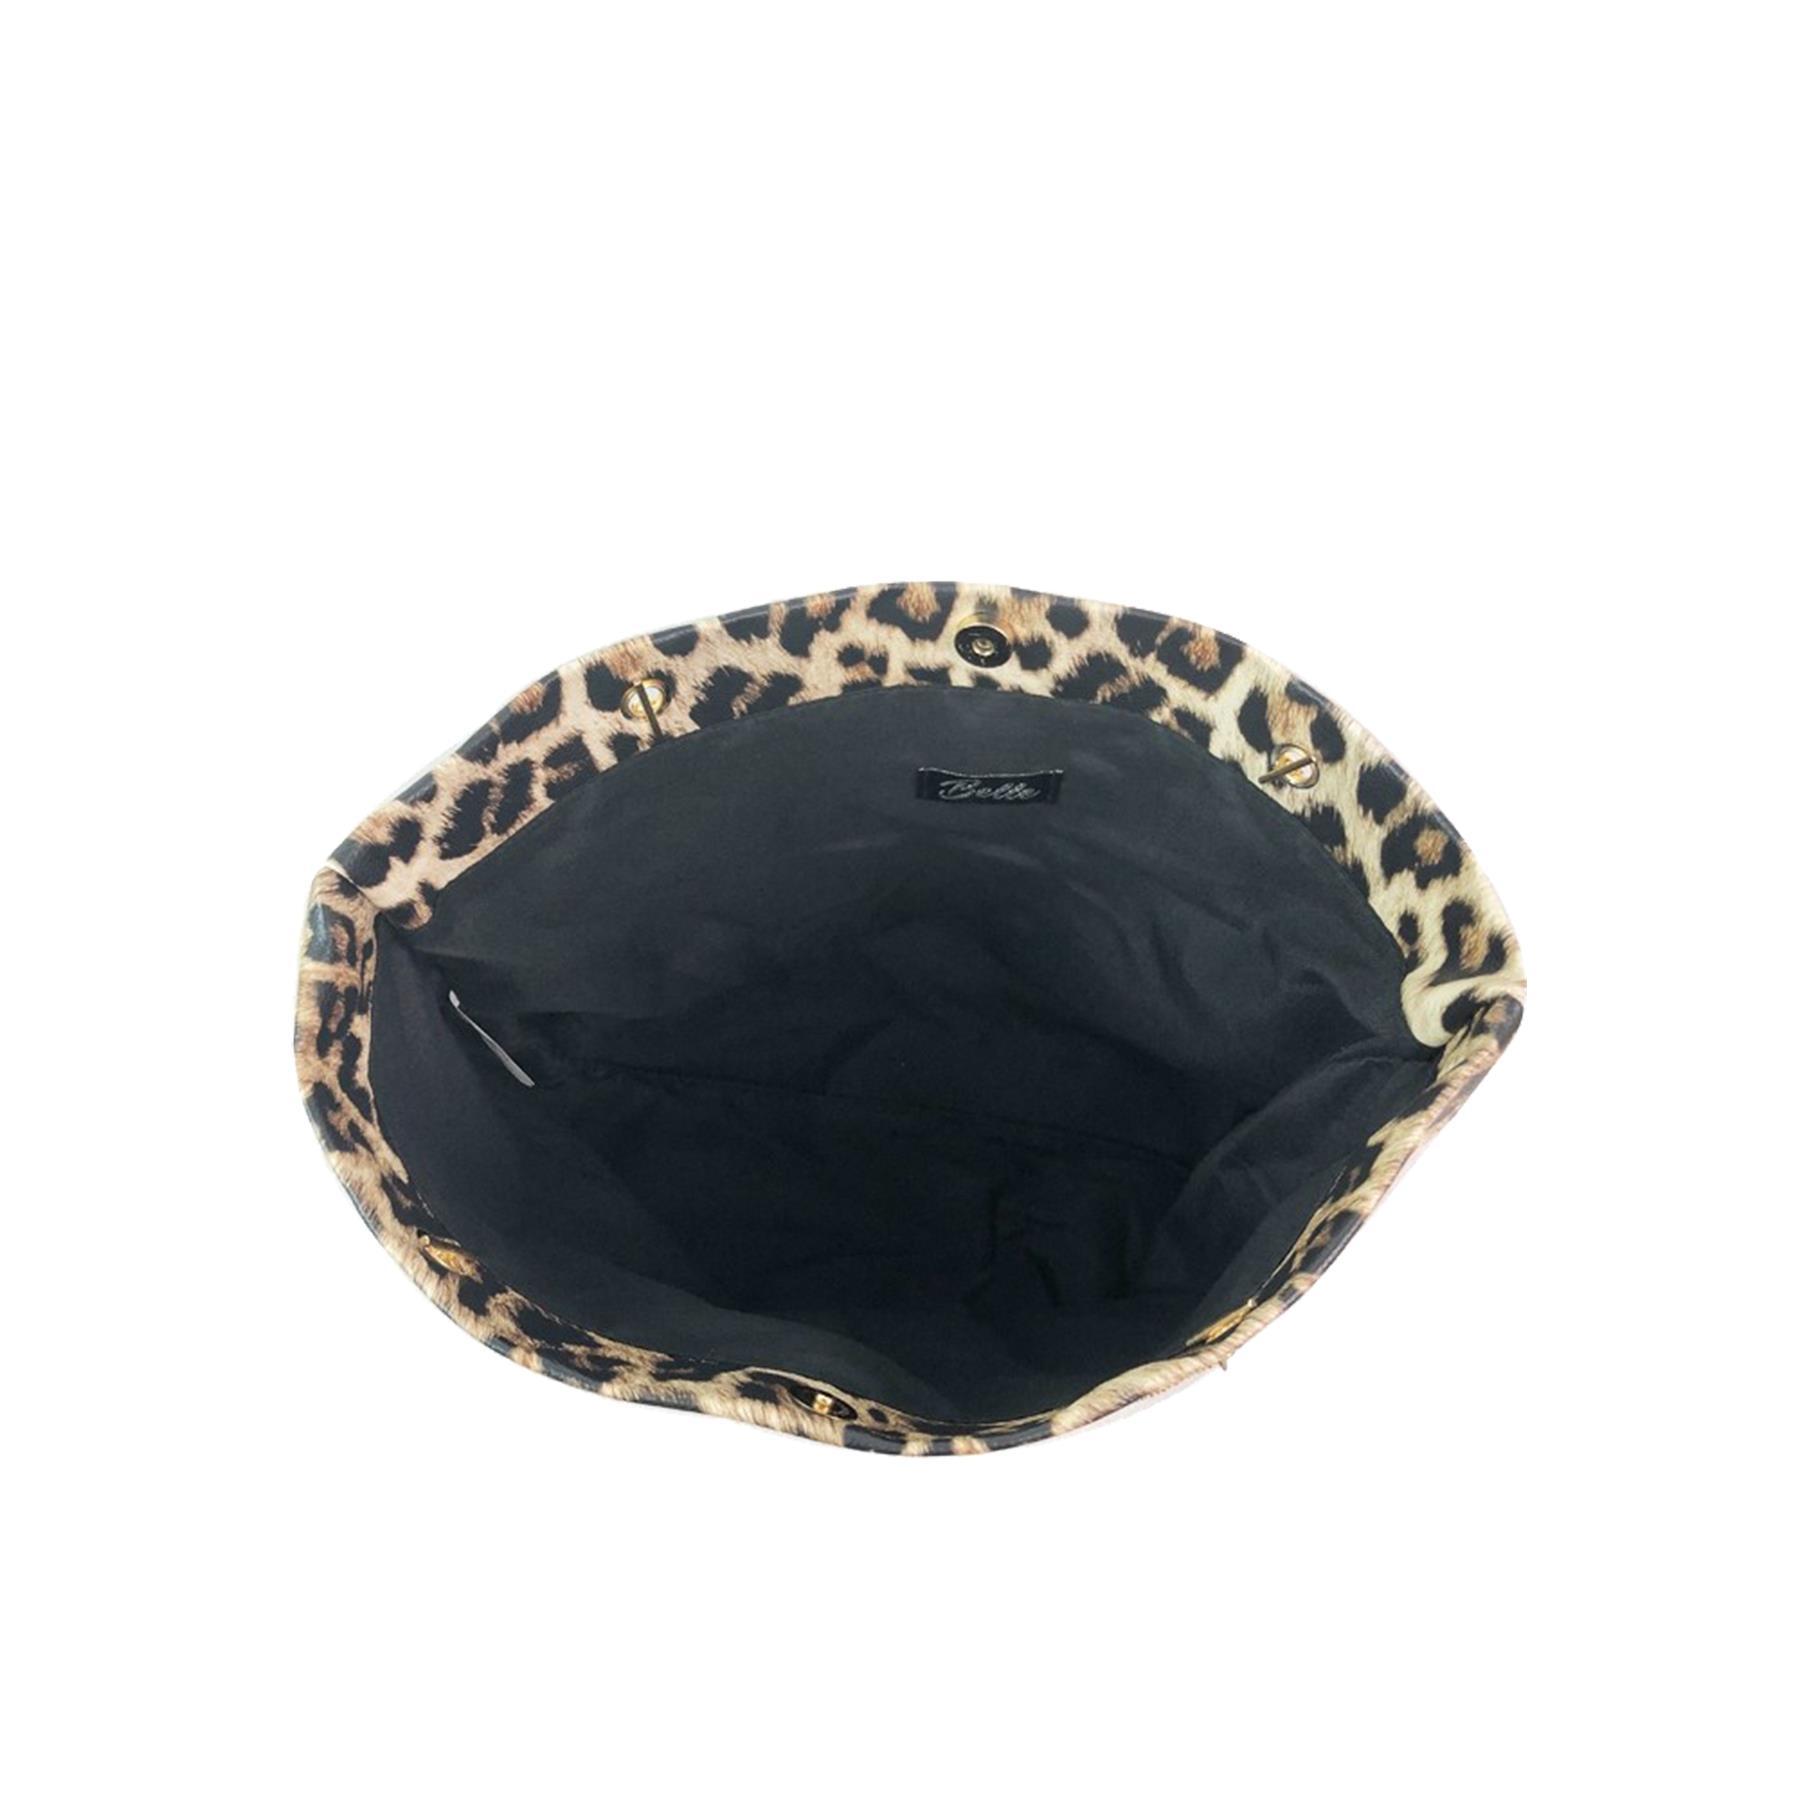 New-Women-s-Zebra-Leopard-Print-Faux-Leather-Fashion-Shoulder-Bags thumbnail 10